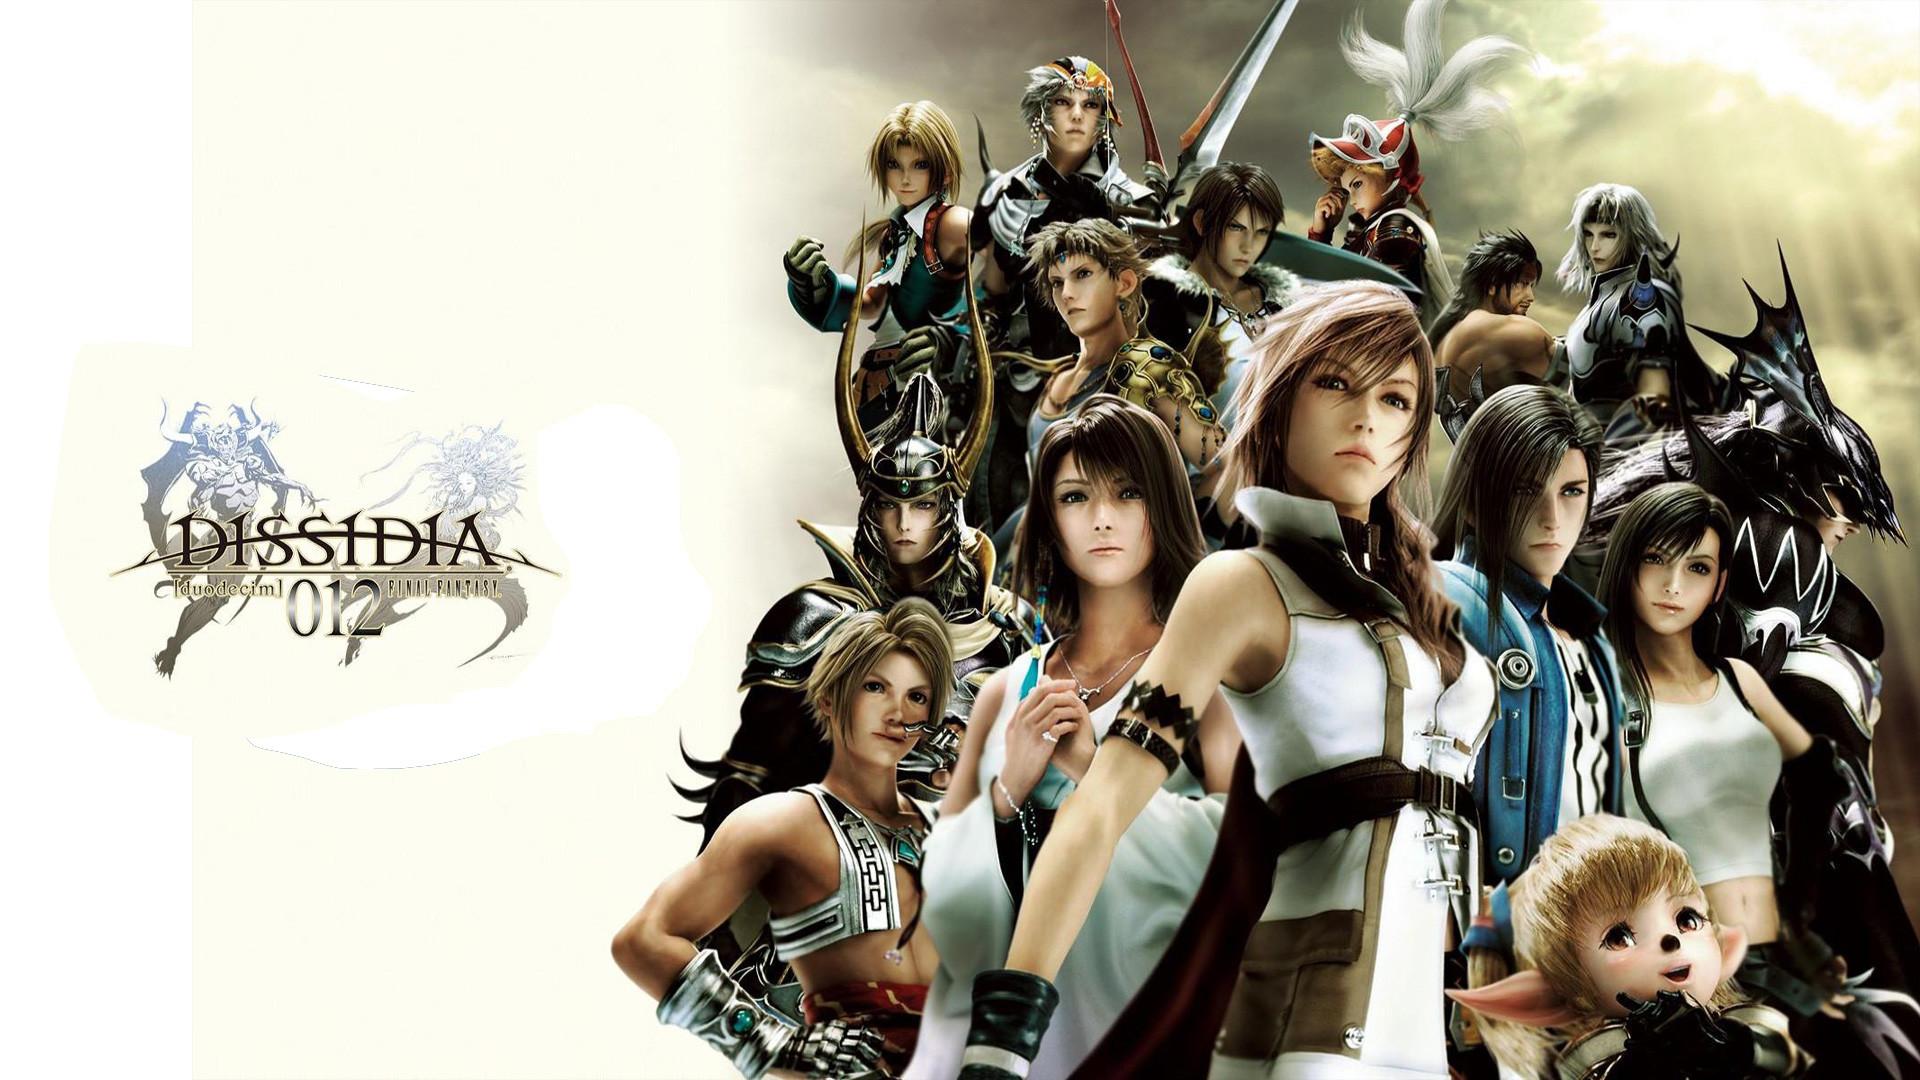 Final Fantasy Xiv Ps3 Battlefield 4 Wallpaper #16528 Hd Wallpapers .